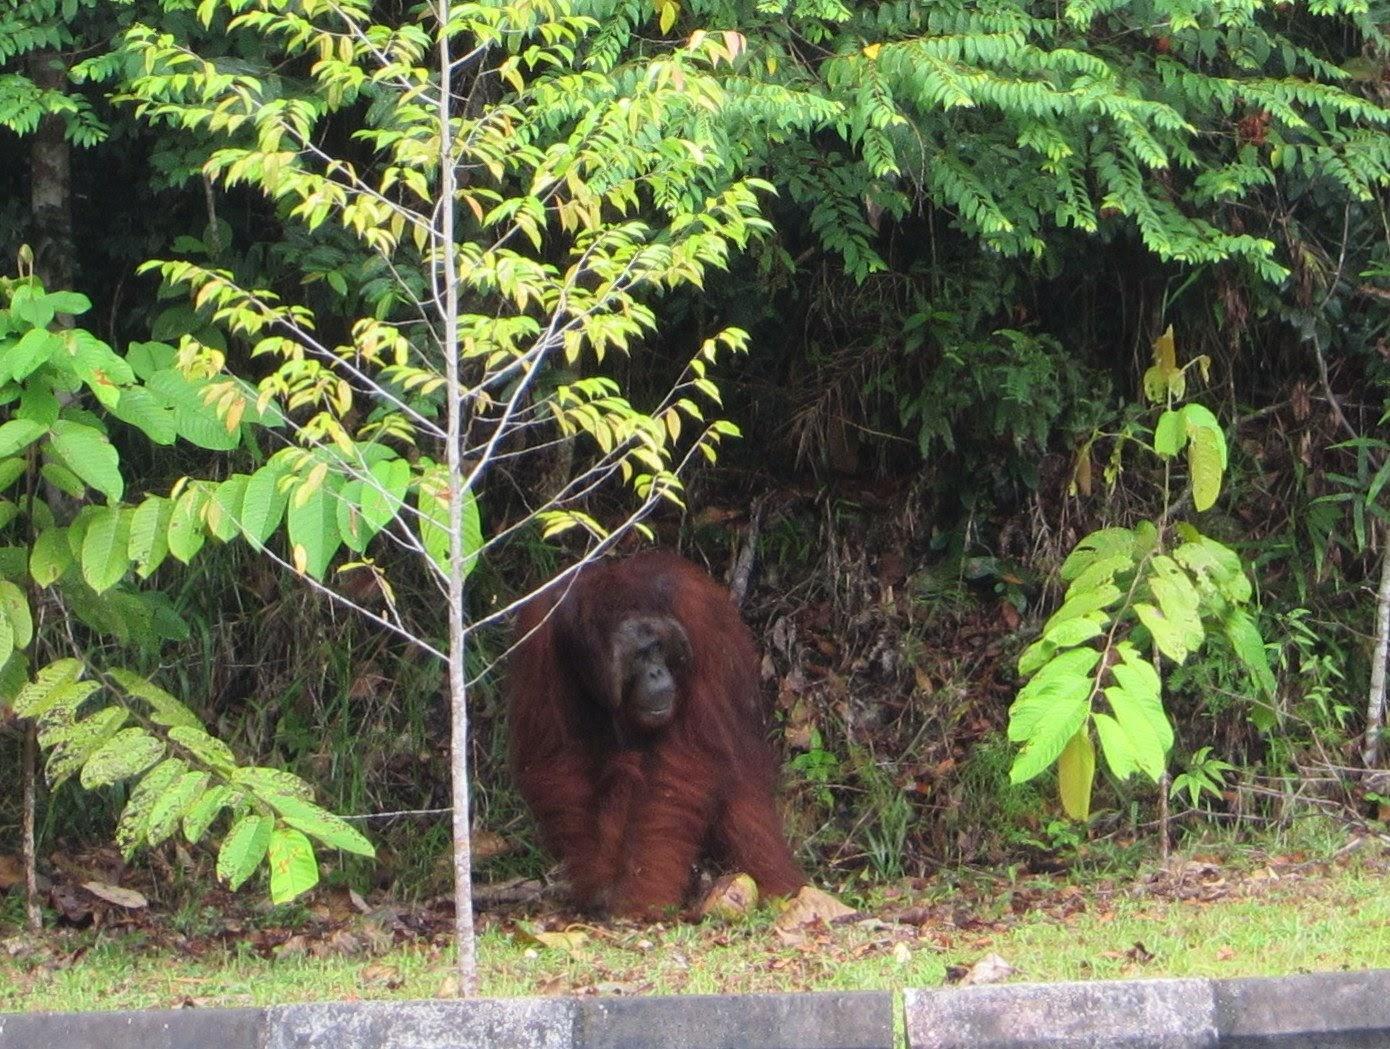 /images/Orangutan.jpg